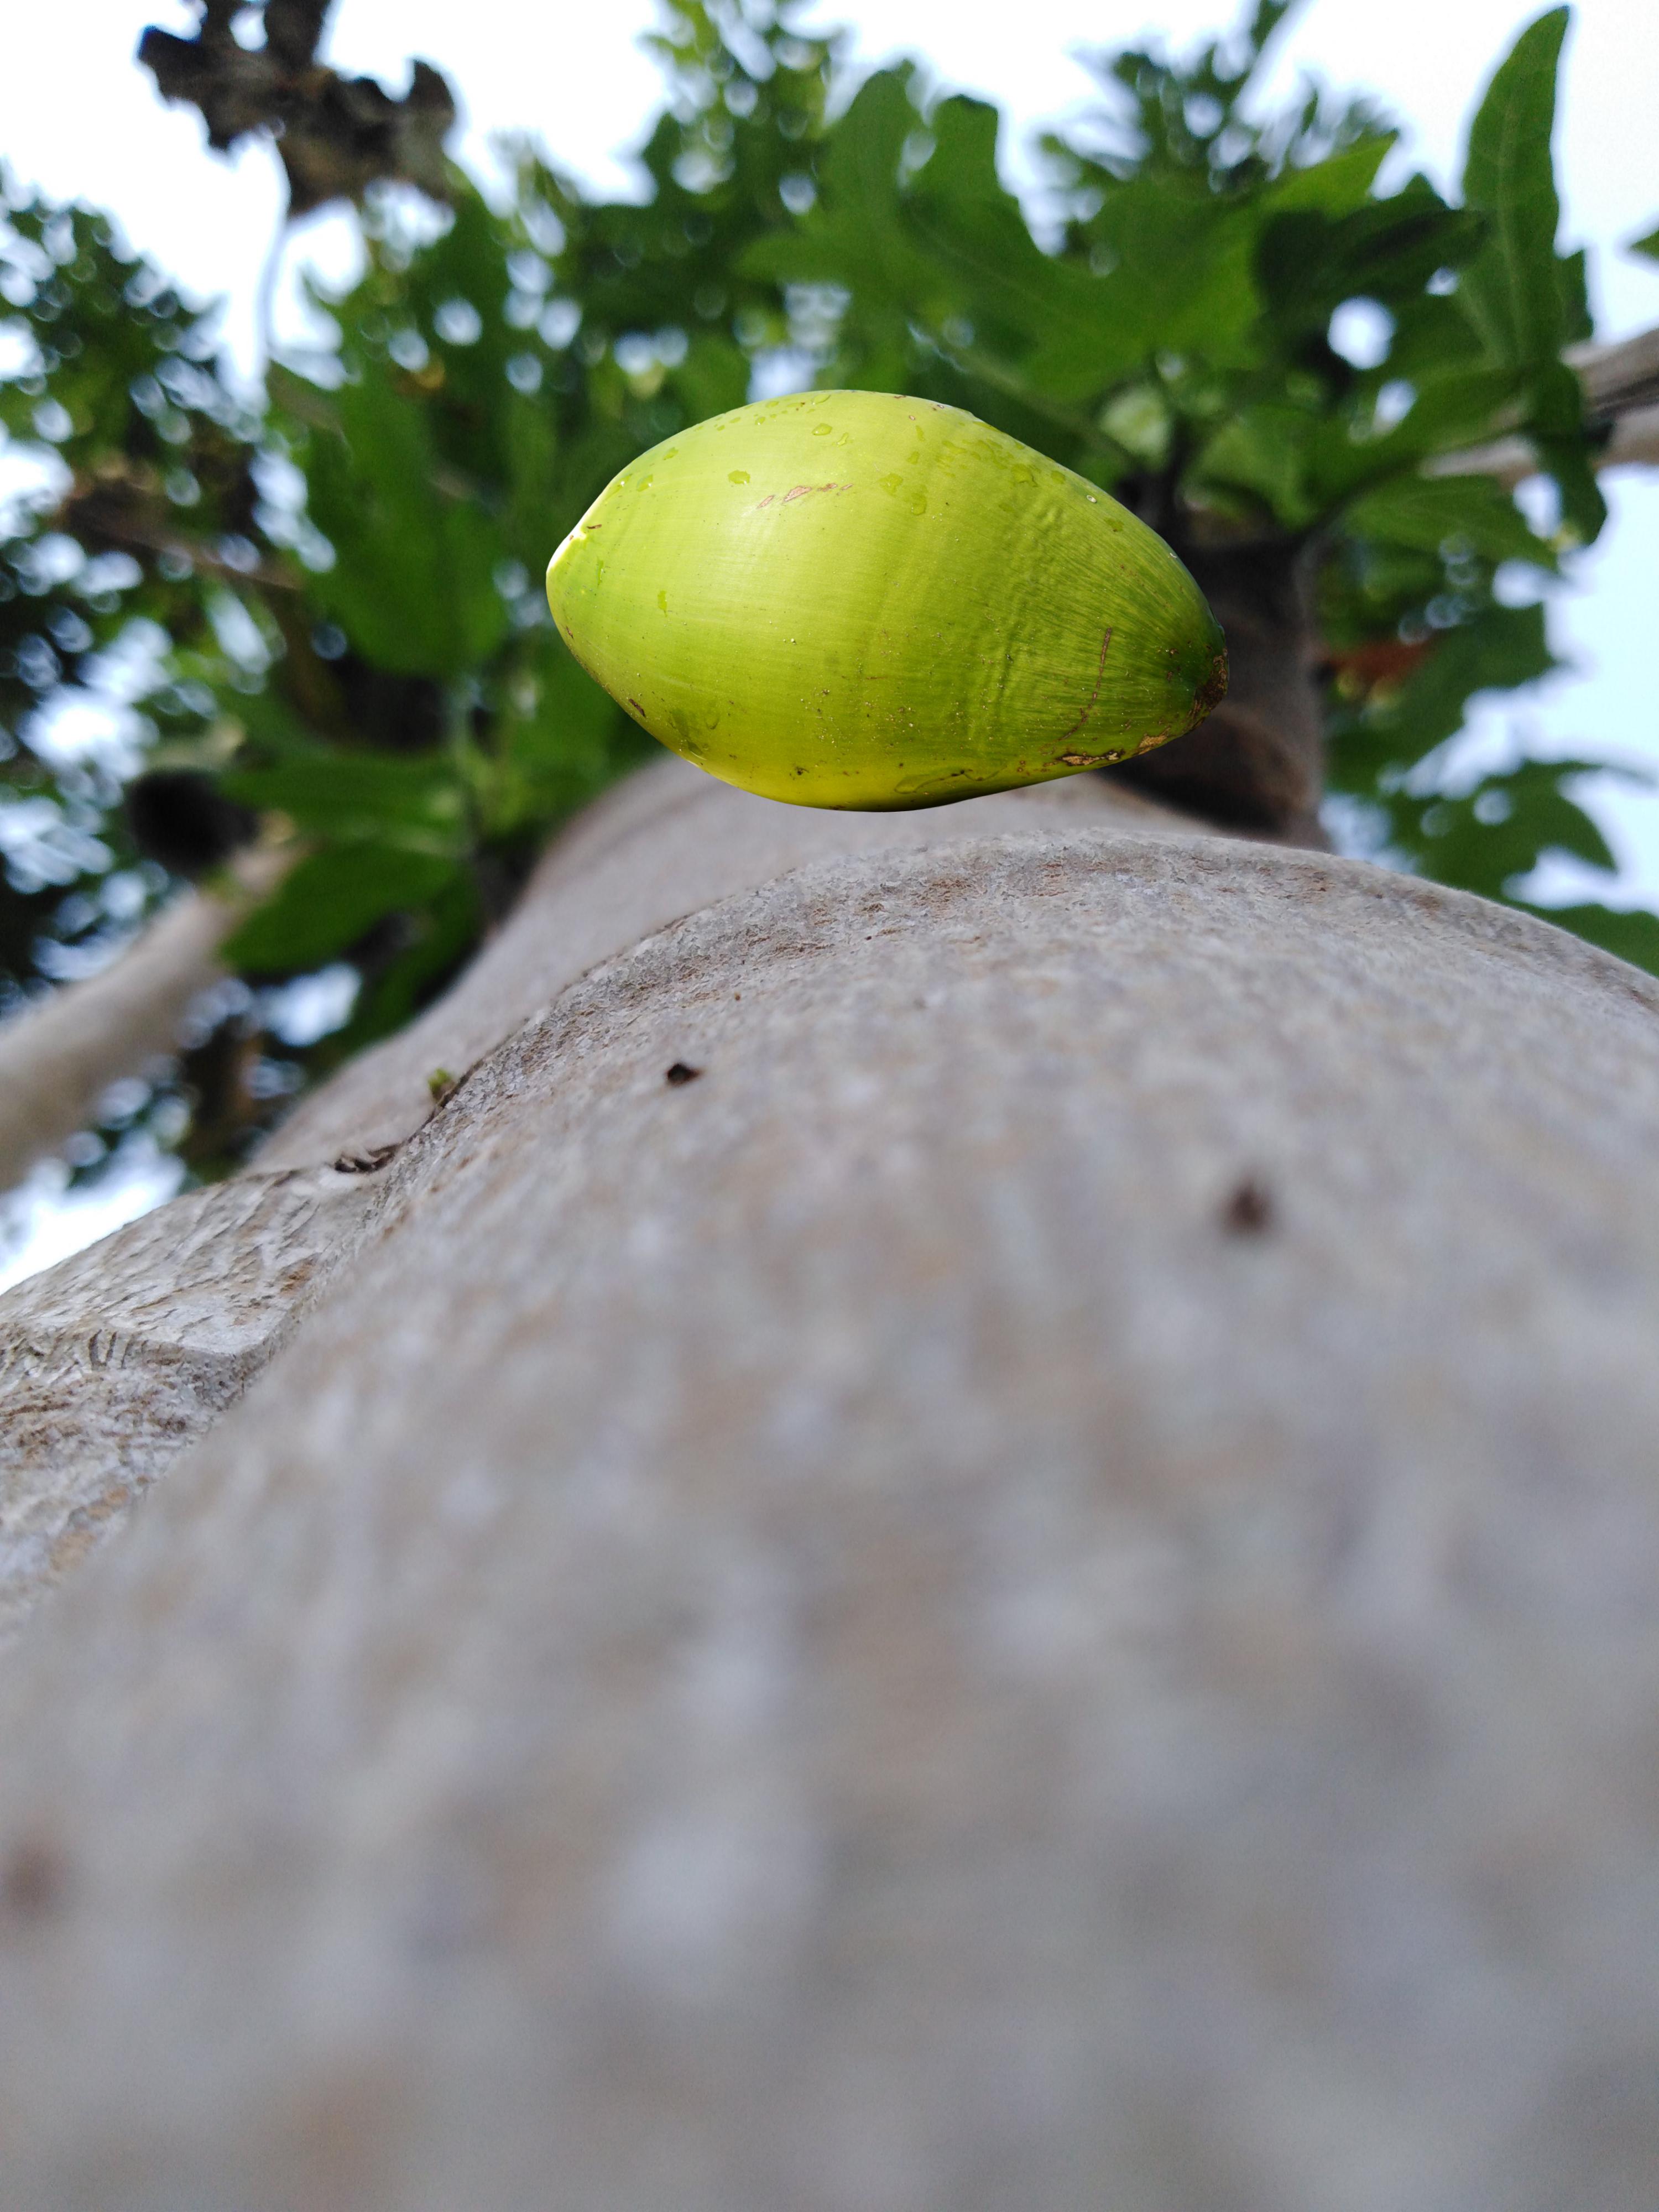 A falling fruit